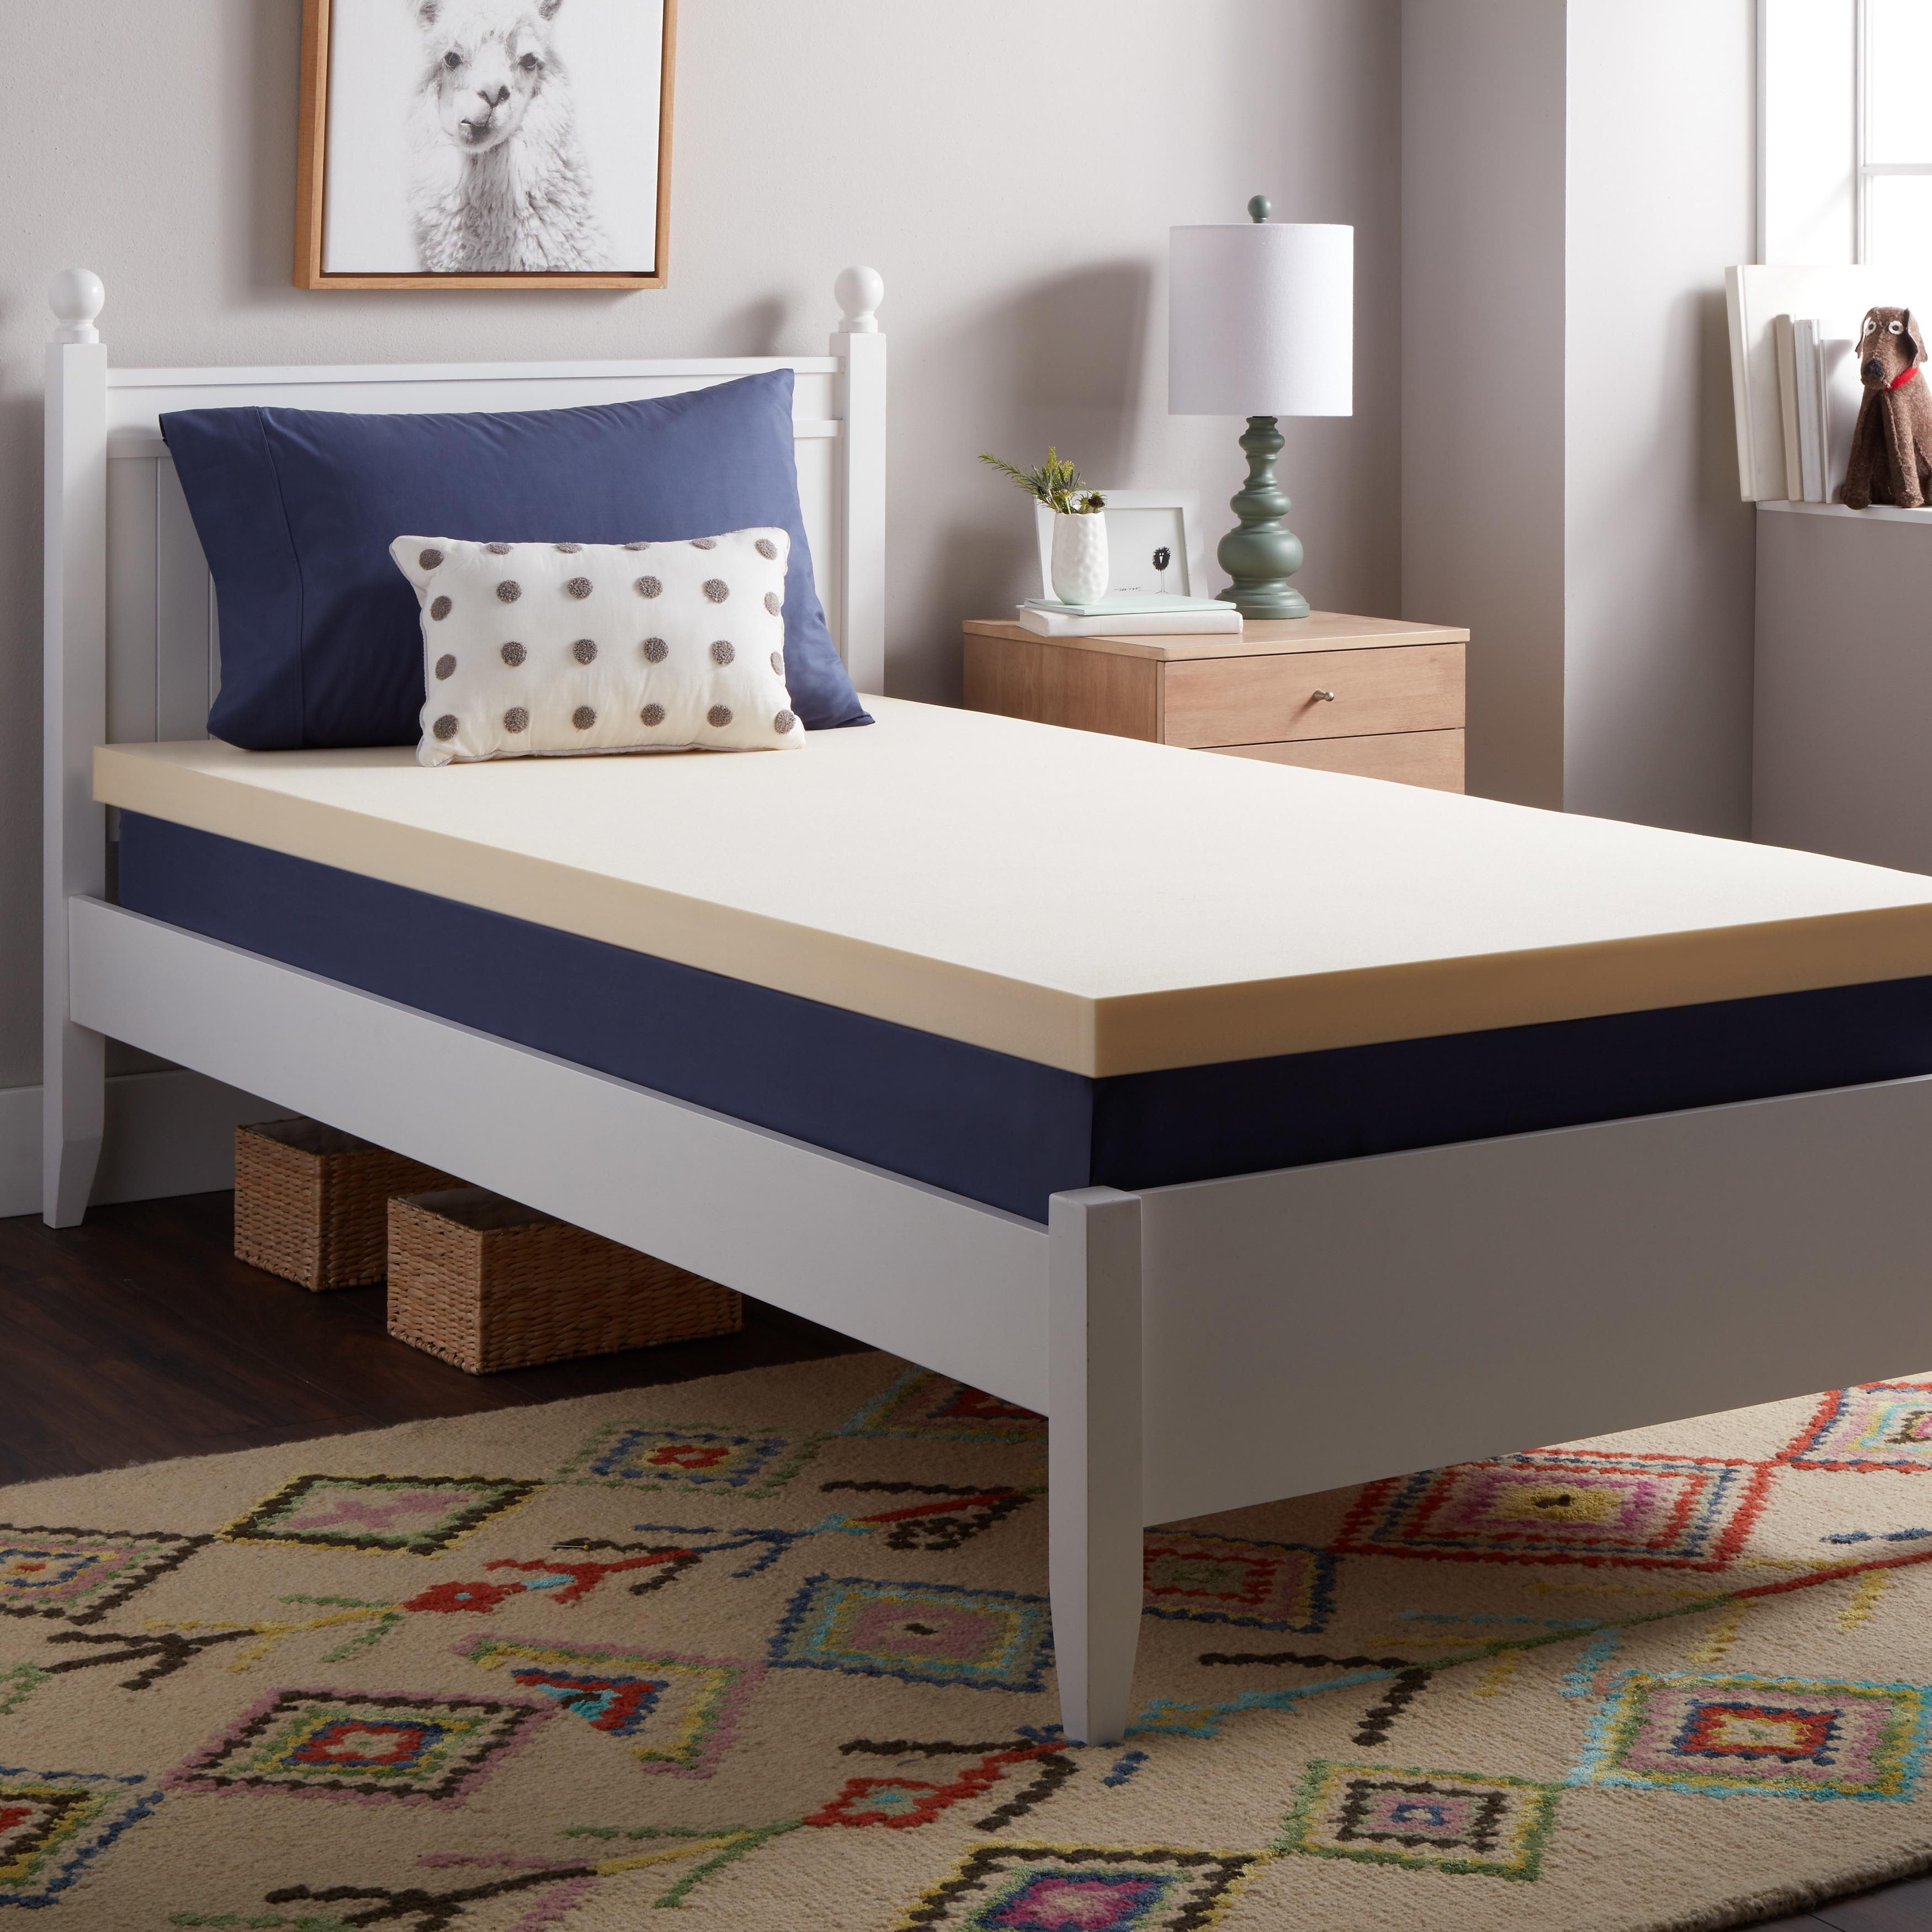 Select Luxury Flippable 2-inch Bunk Bed Memory Foam Mattr...